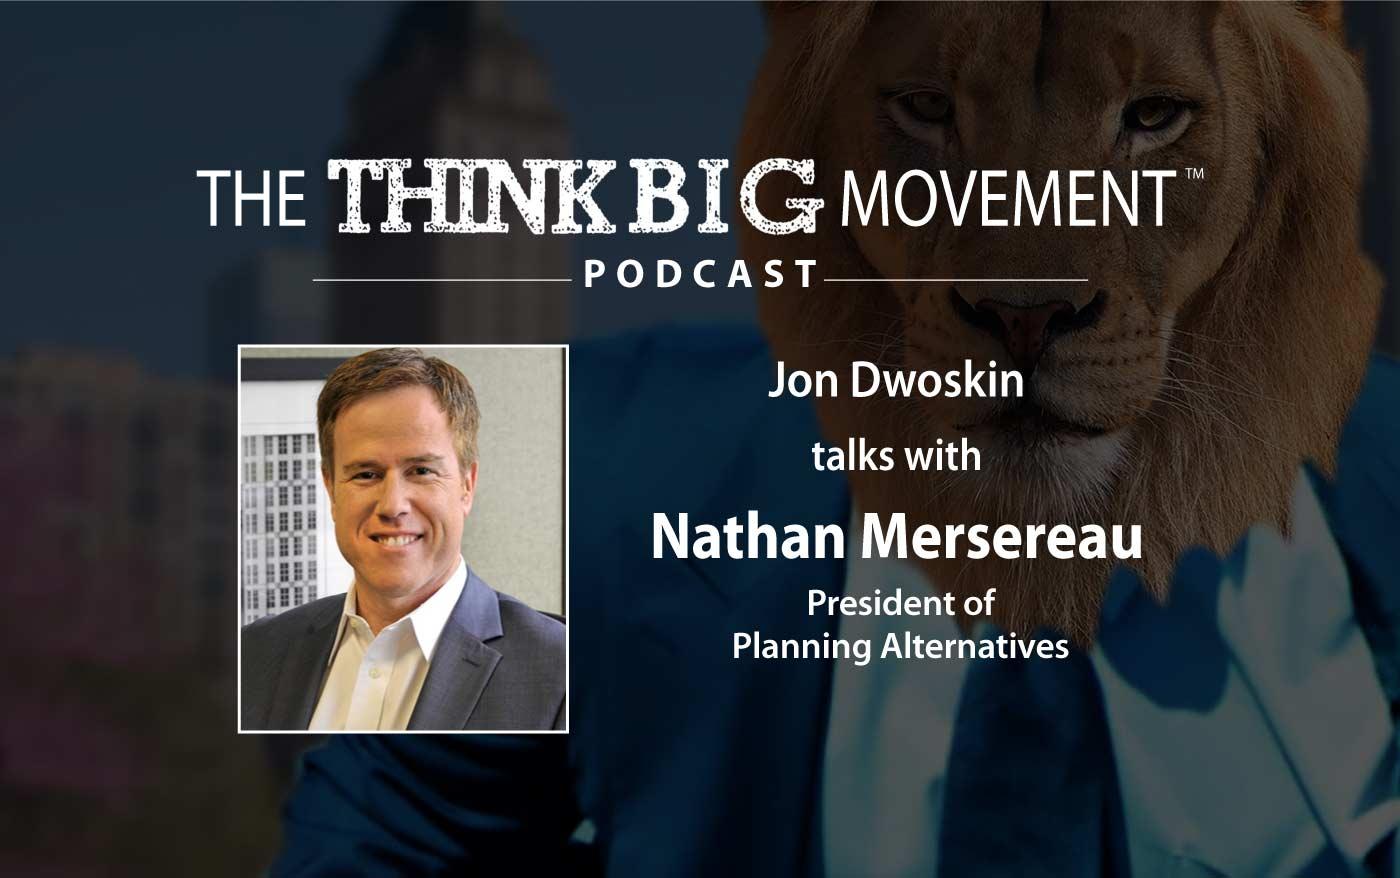 Think Big Movement Podcast - Jon Dwoskin Interviews Nathan Mersereau, President of Planning Alternatives